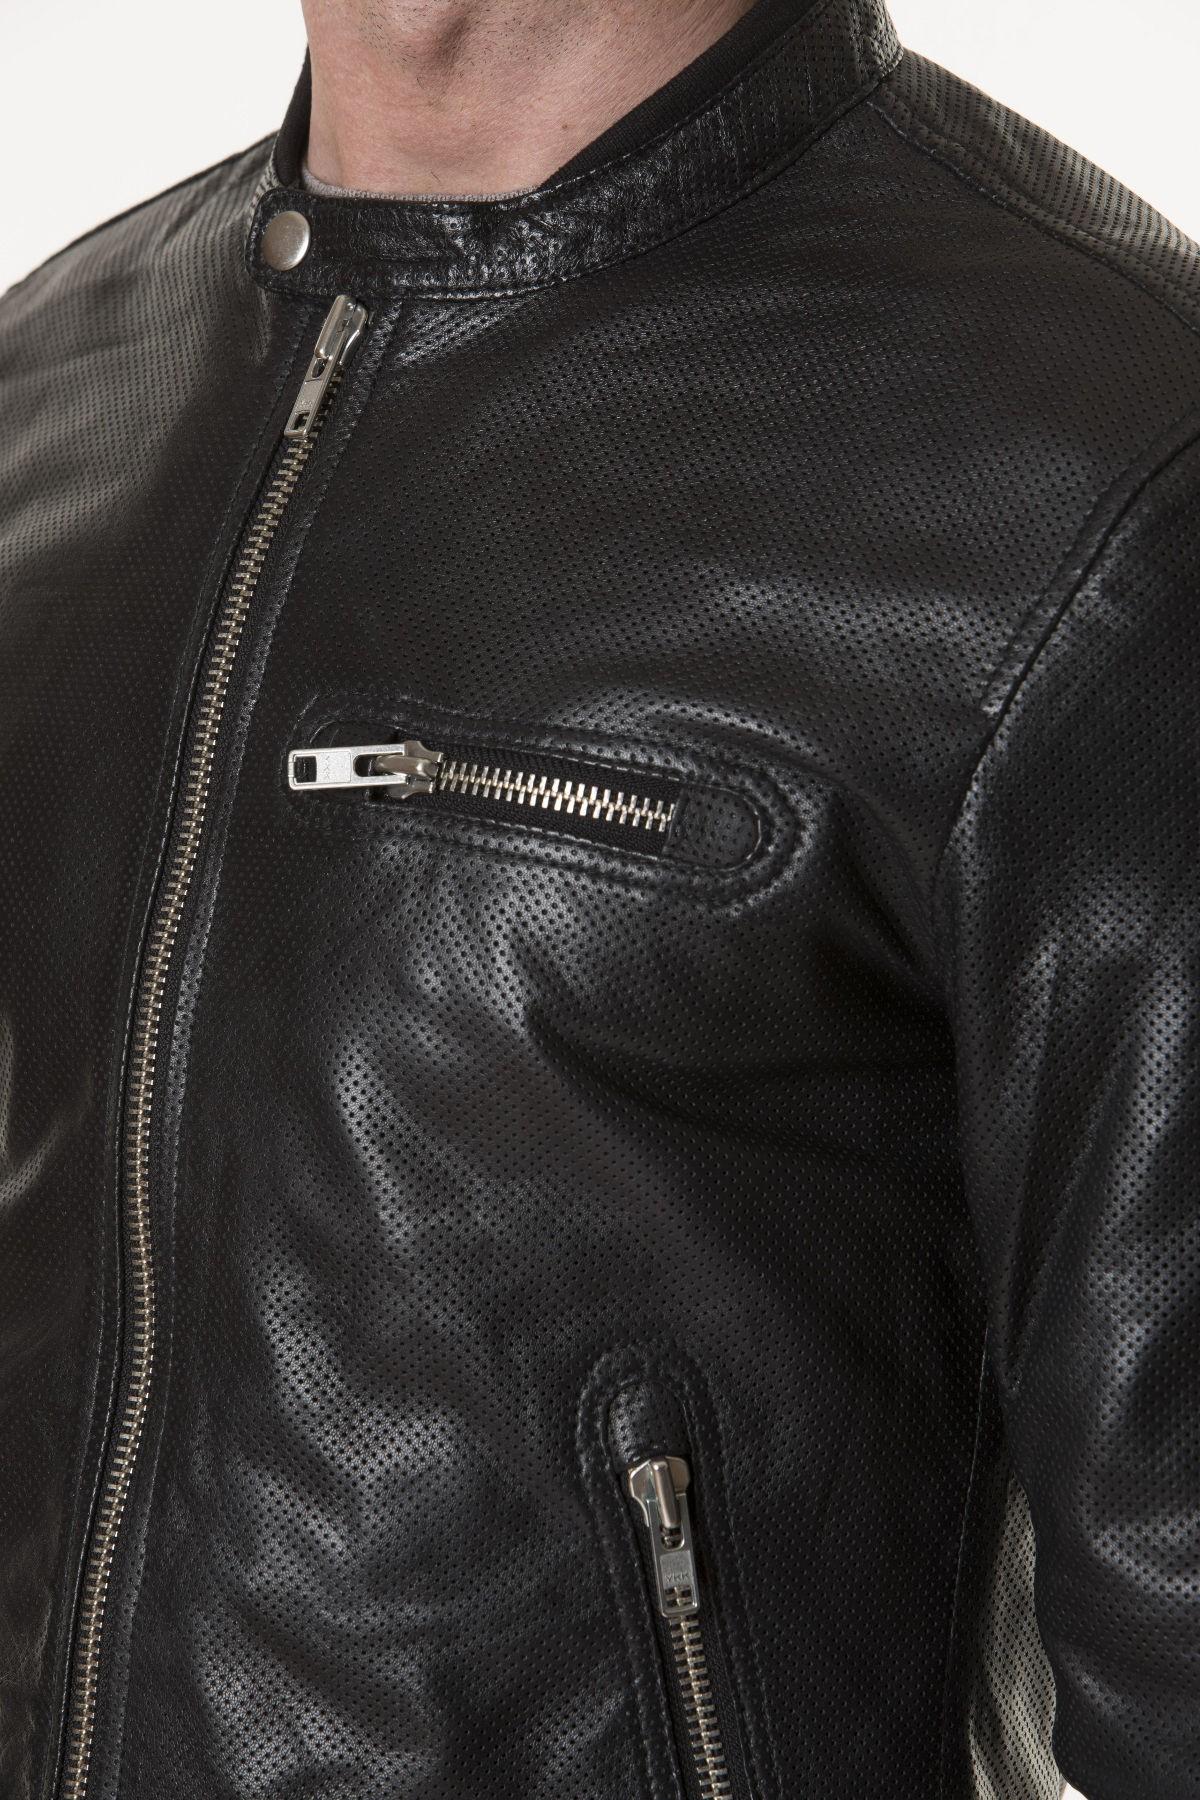 Rione Ss Jacket For Man Fontana Bully 18 wvvZ1xSqO